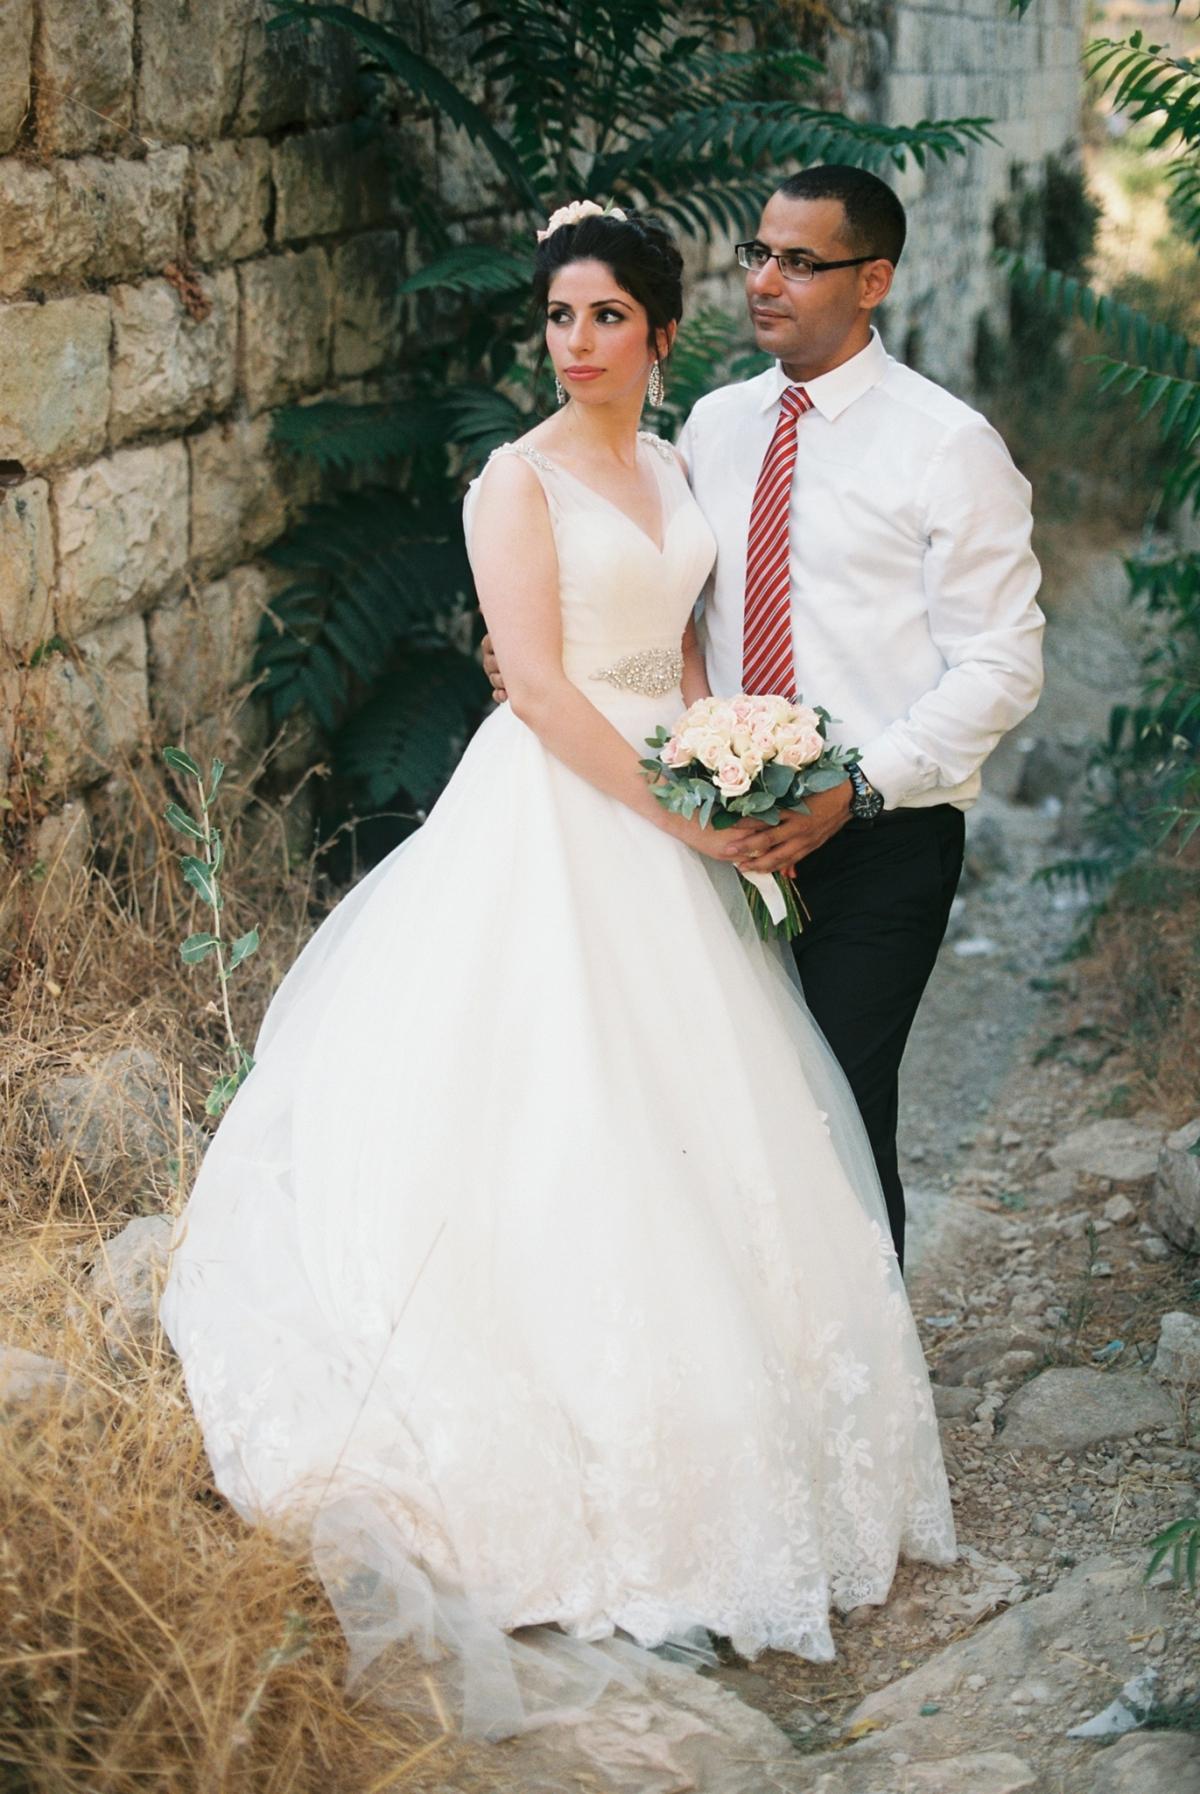 Lifta Bridal Portraits - Jerusalem Israel - Muna and Ali - Sigala Photography_0005